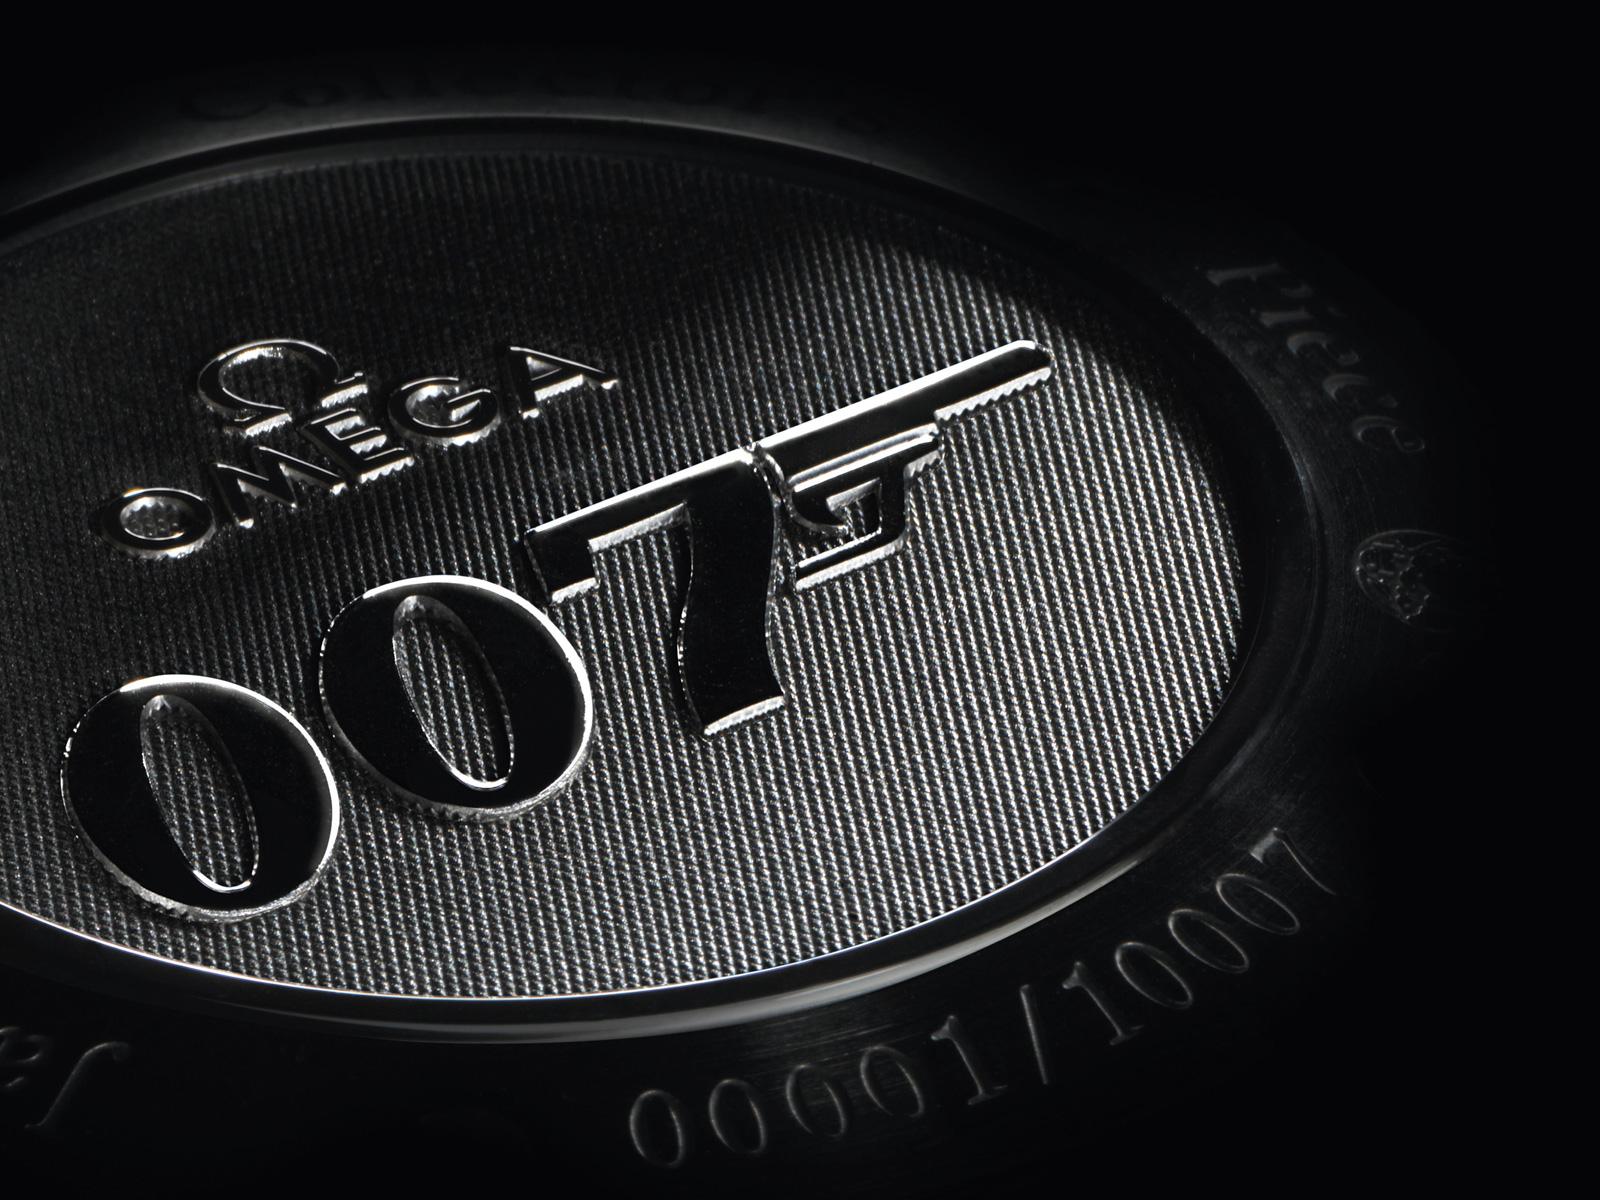 Animation Movie Wallpaper Desktop Wallpaper Omega Seamaster Watch 007 Logo Desktop